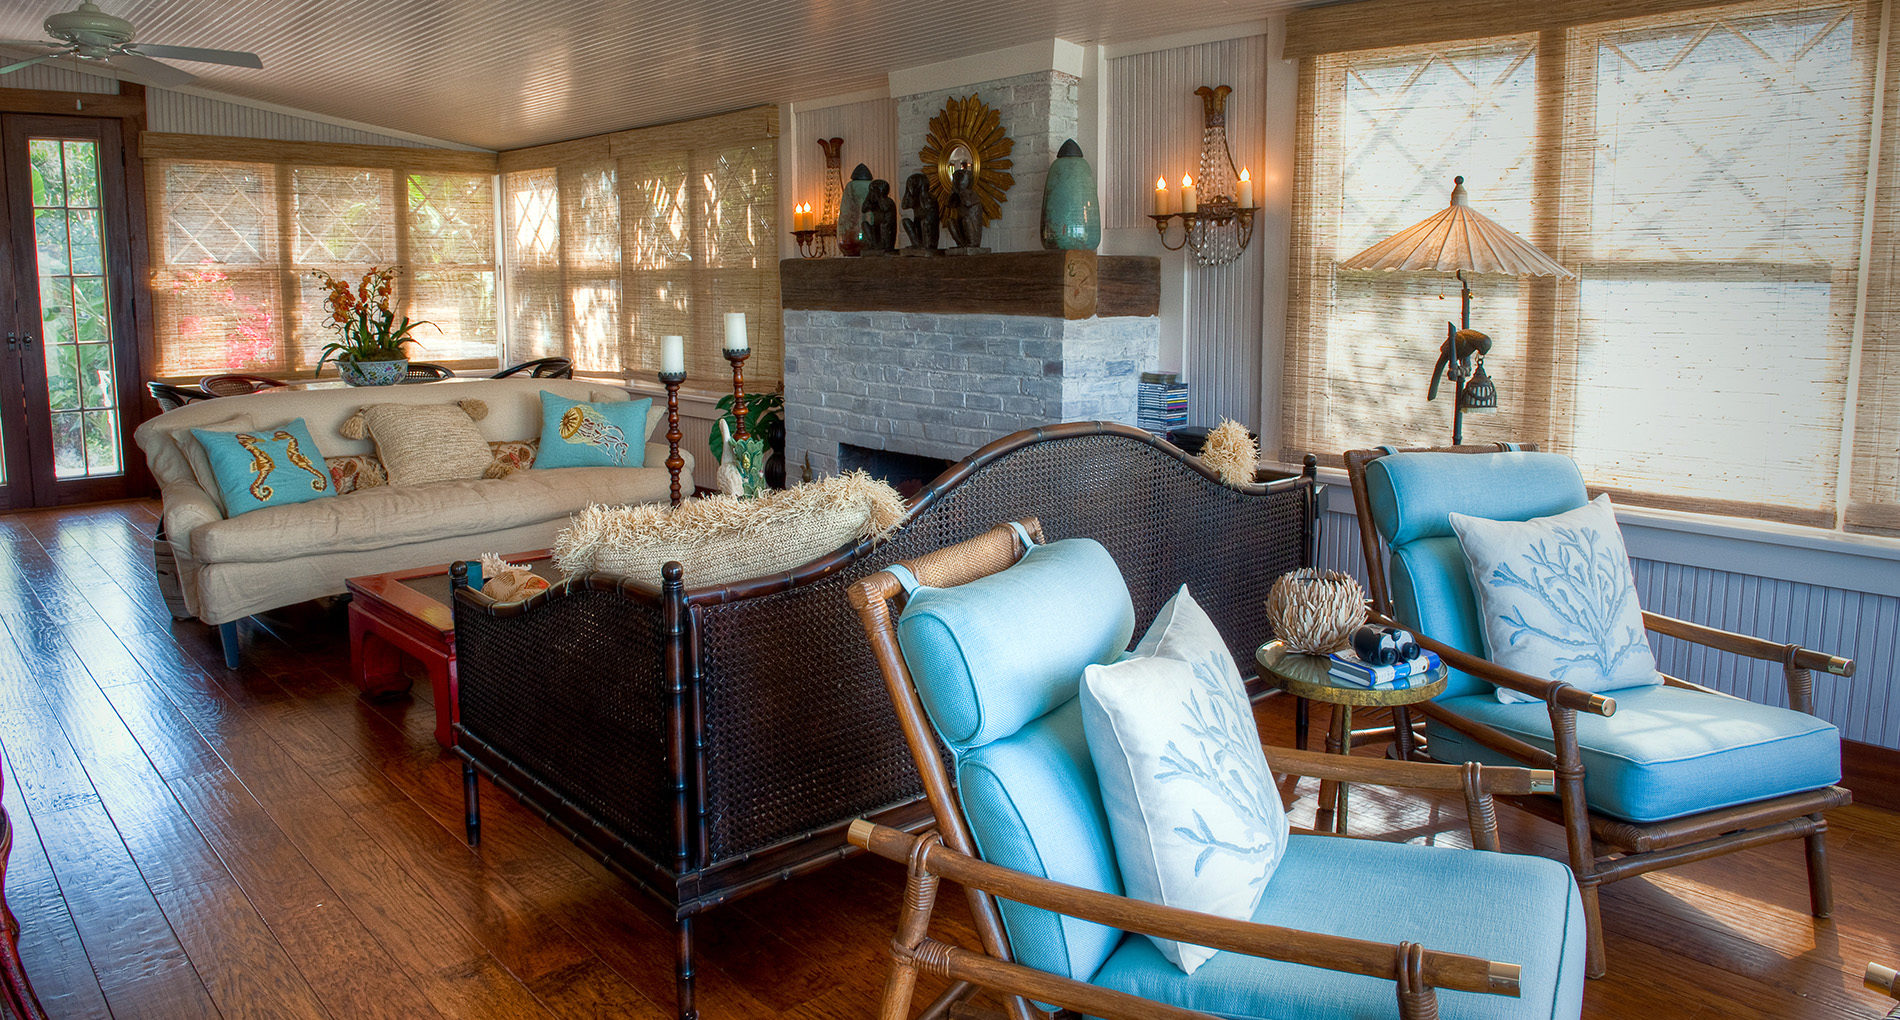 Home Remodel Orlando Captivabayside Slider